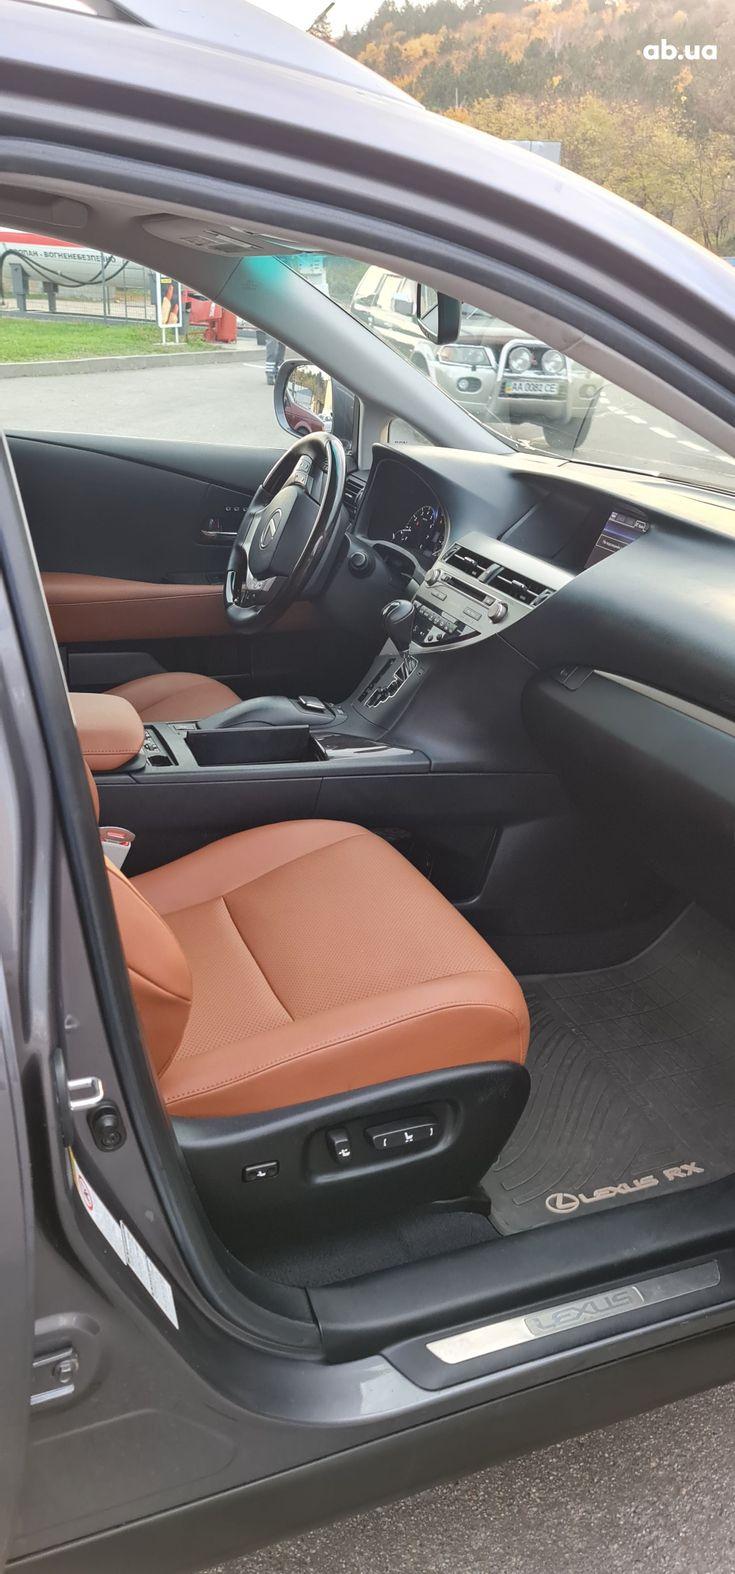 Lexus rx 350 2013 серый - фото 13